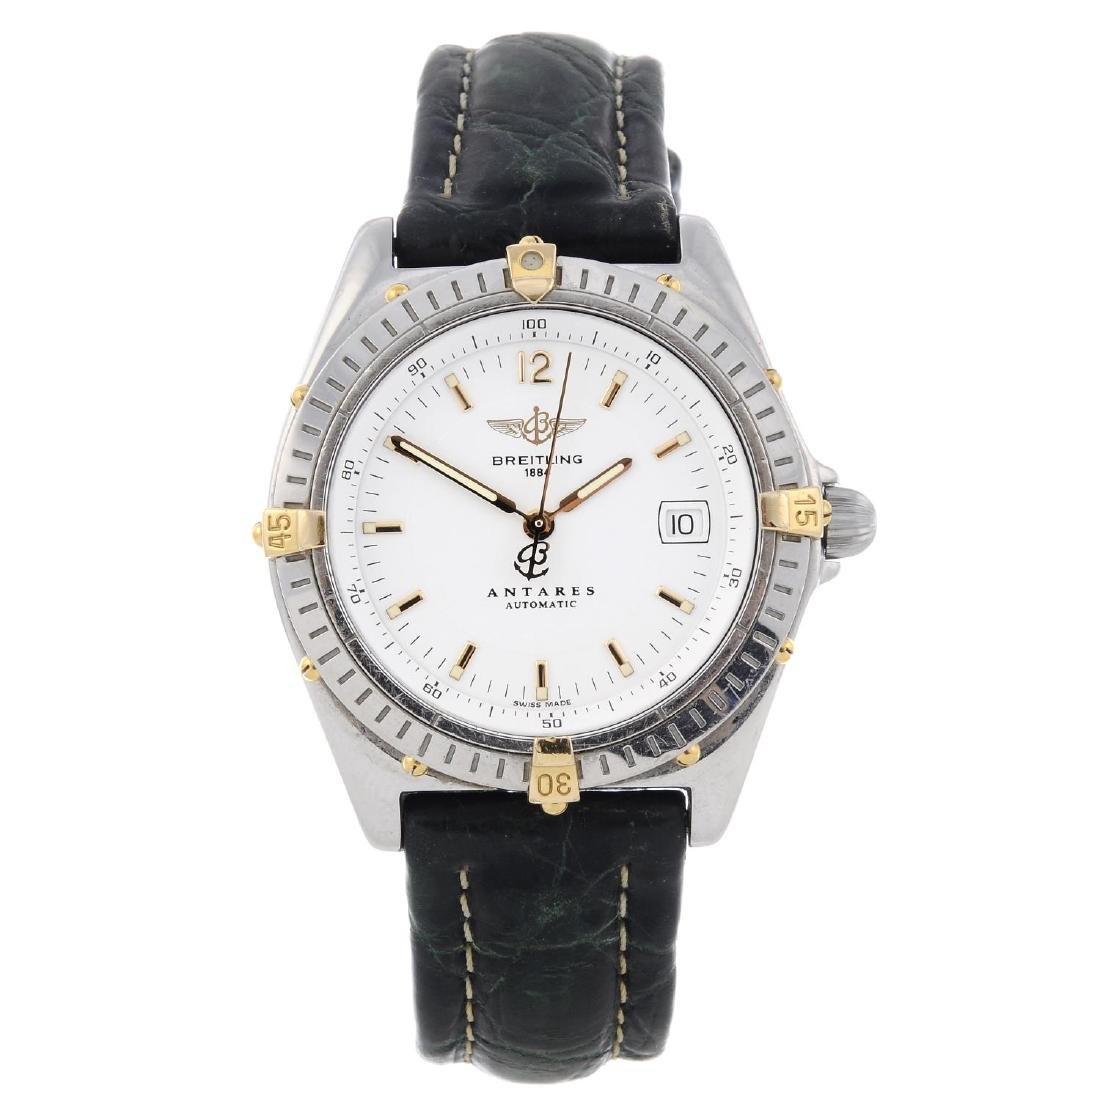 BREITLING - a gentleman's Antares wrist watch.